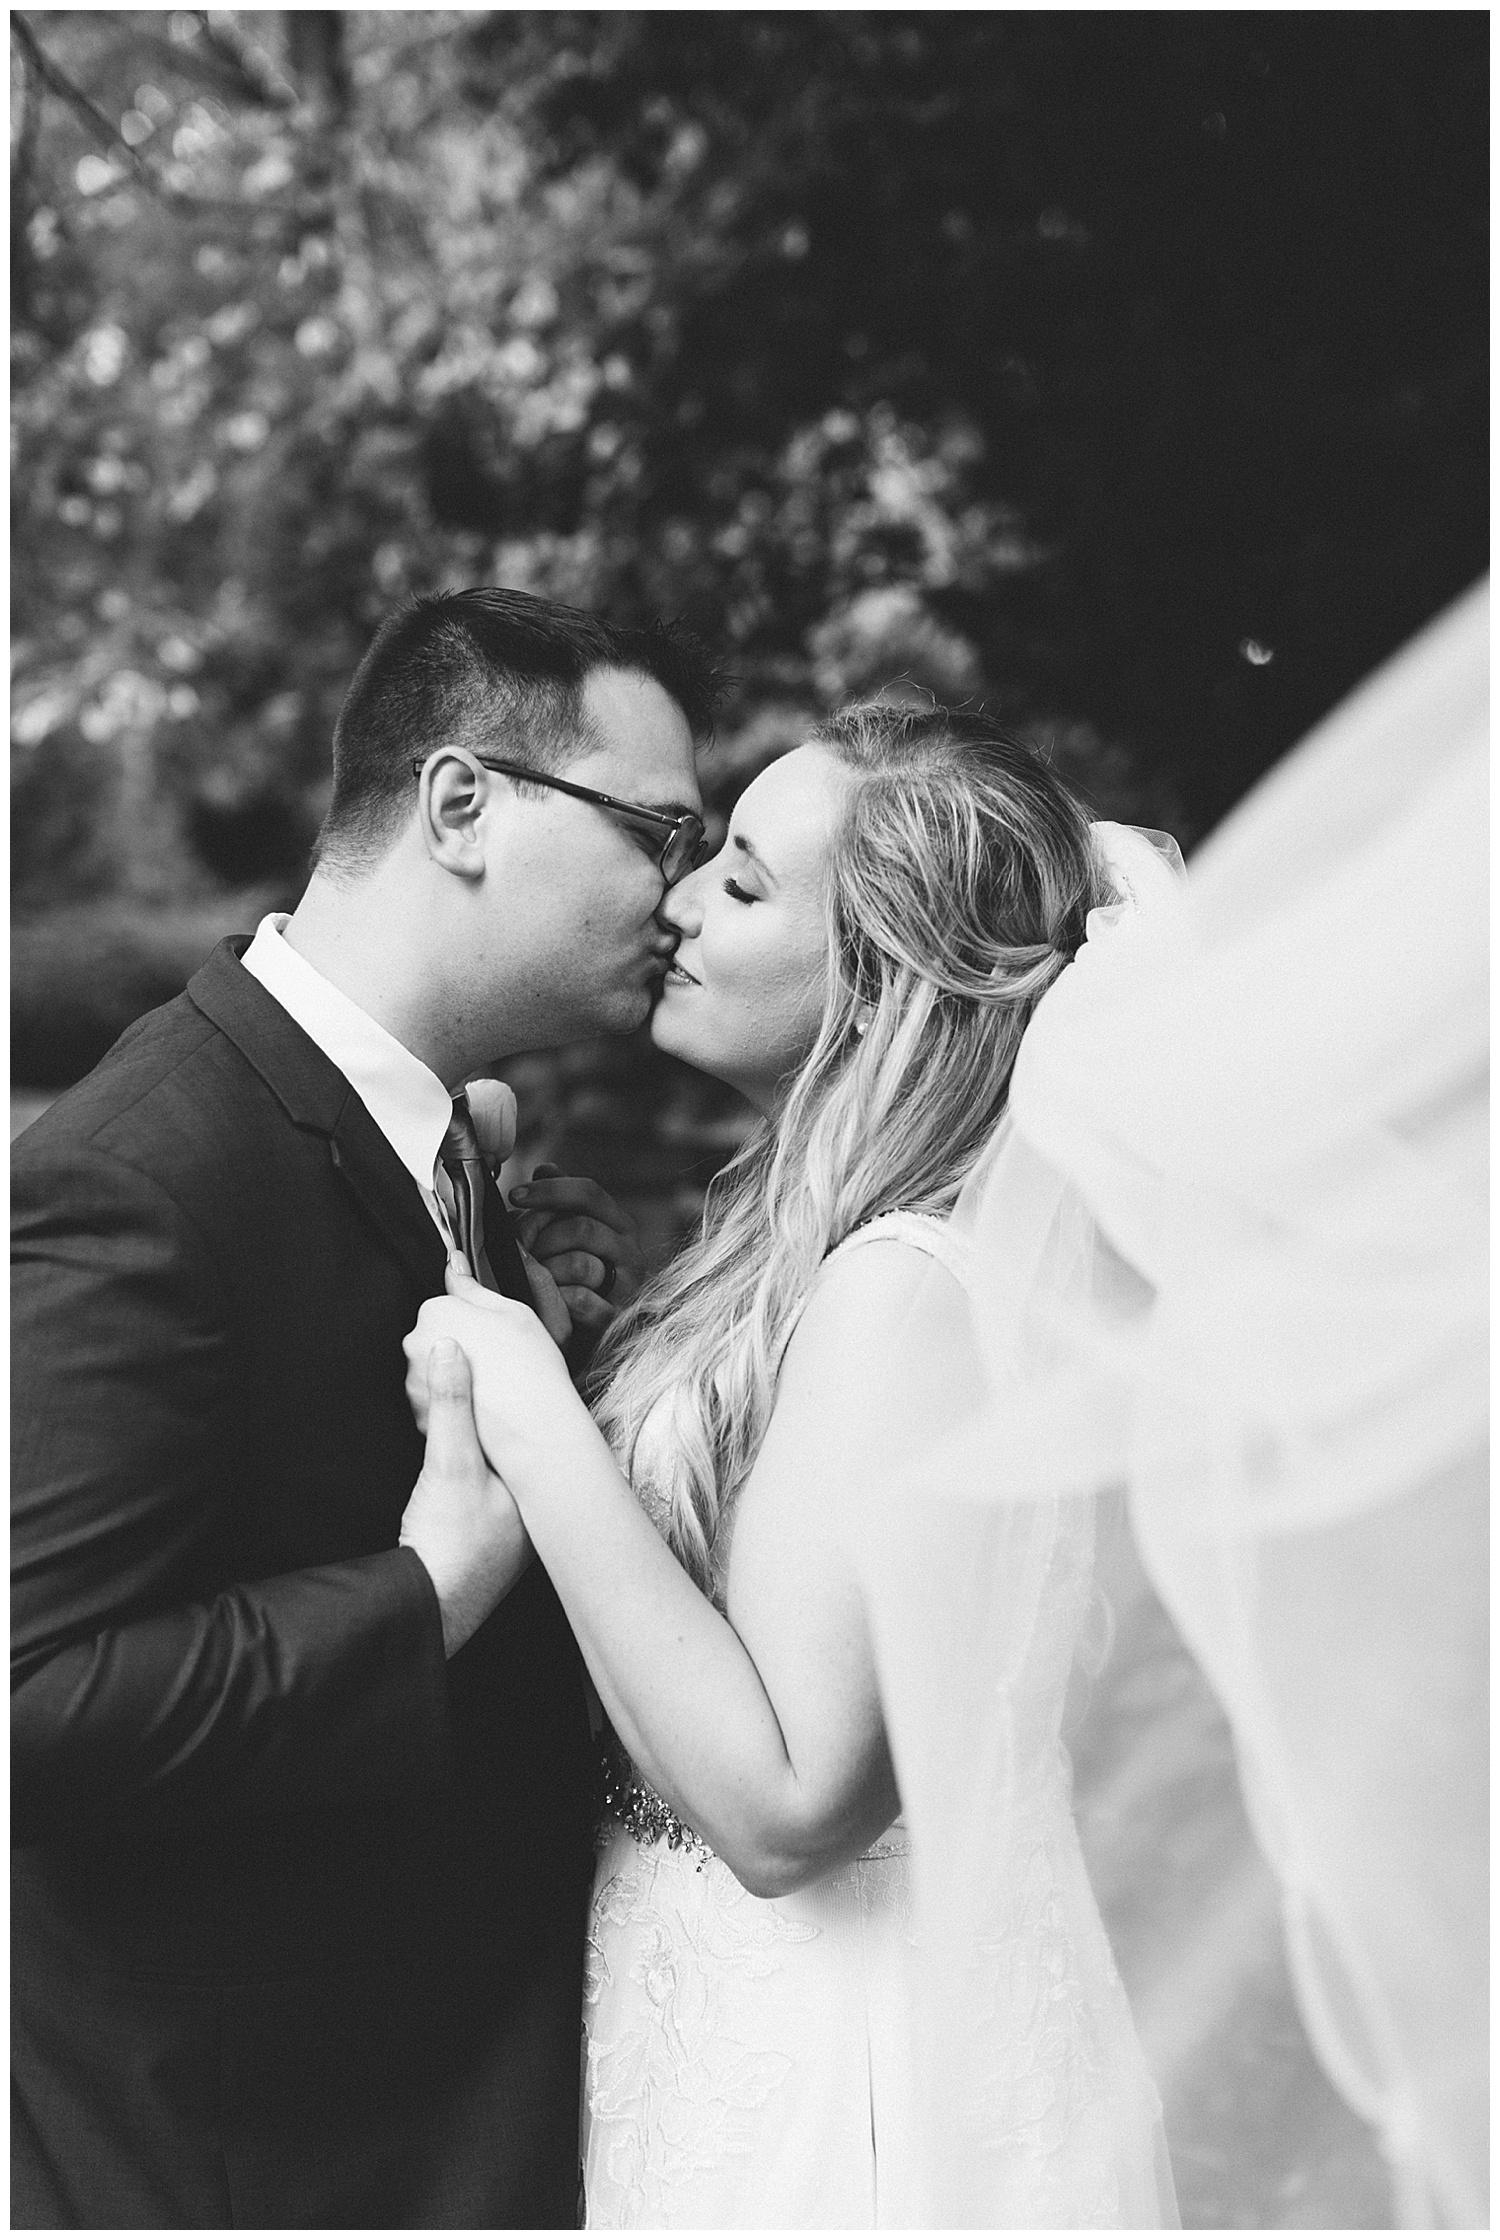 trent.and.kendra.photography.whitehall.wedding-102.jpg